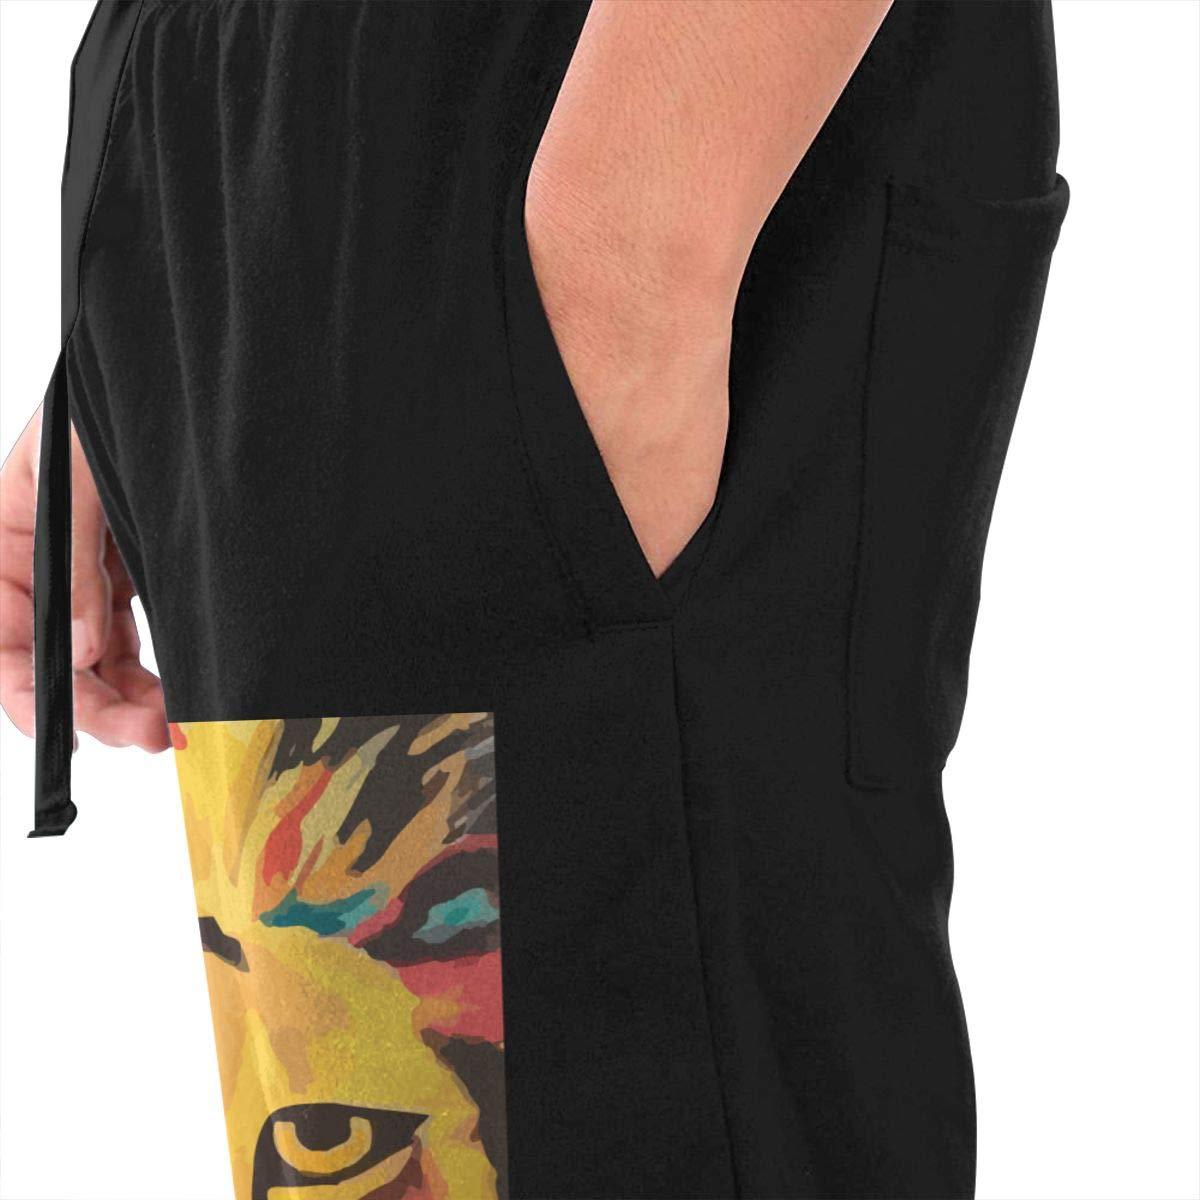 Rainbow Lion Drawstring Waist,100/% Cotton,Elastic Waist Cuffed,Jogger Sweatpants